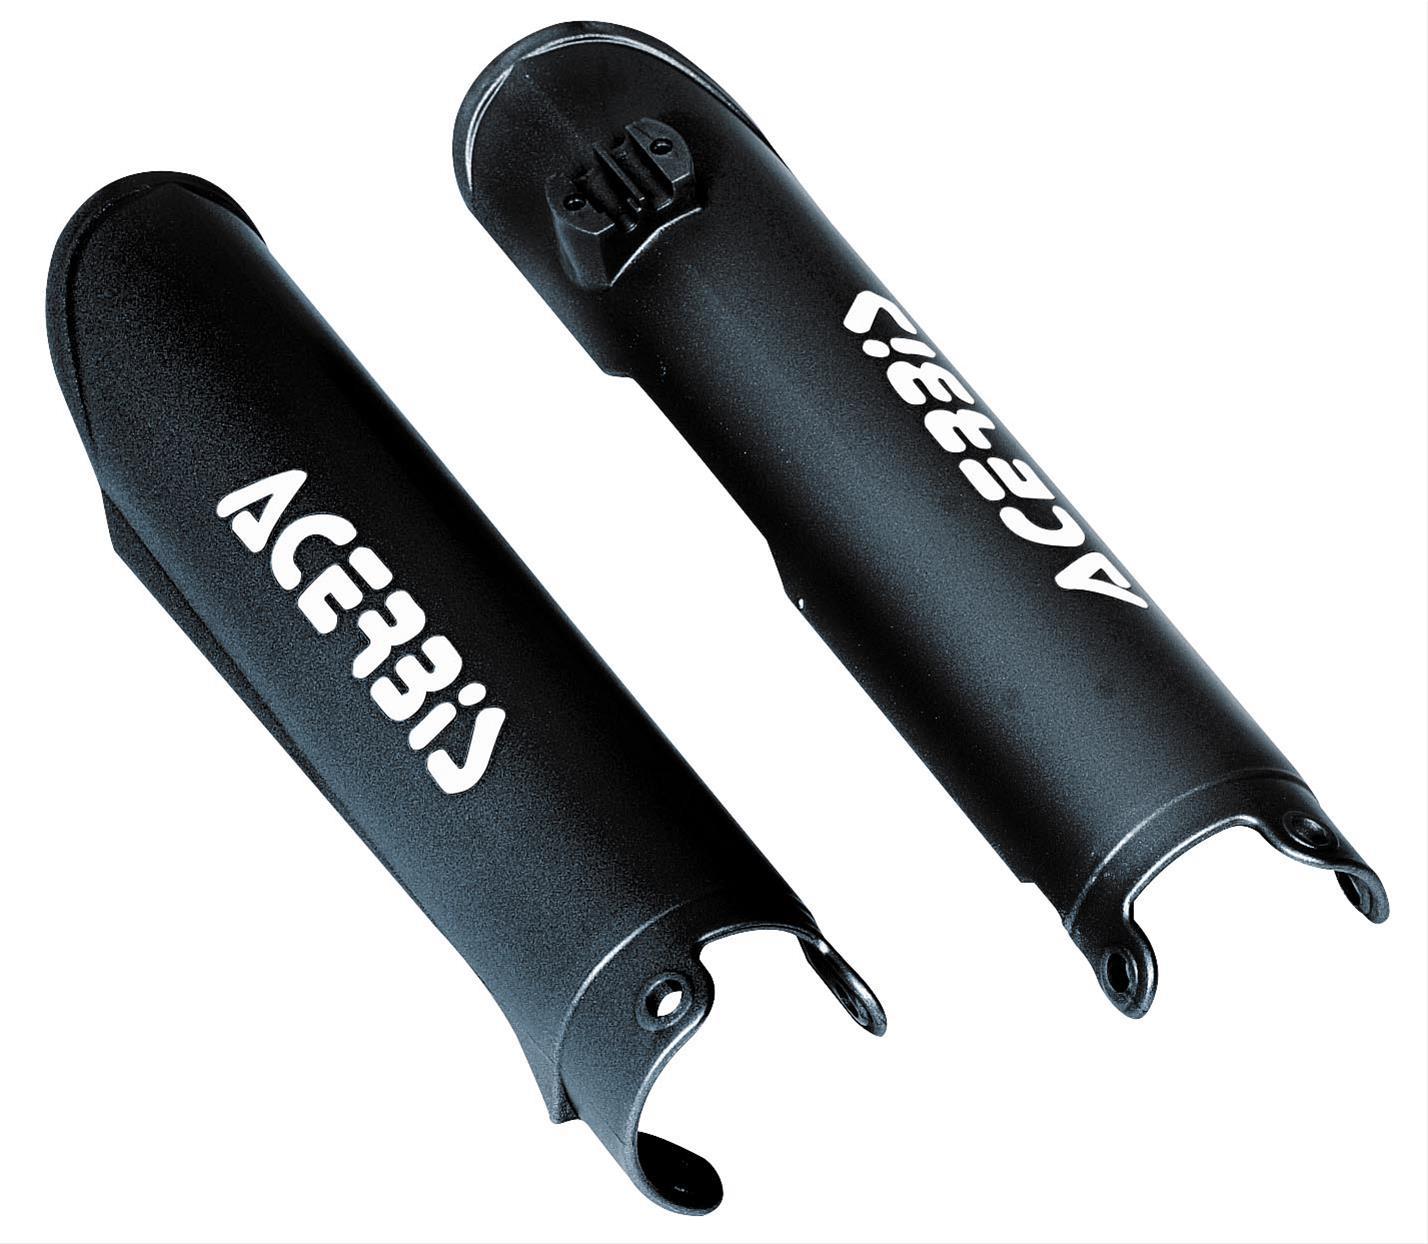 Acerbis 2686520001 Lower Fork Covers Black